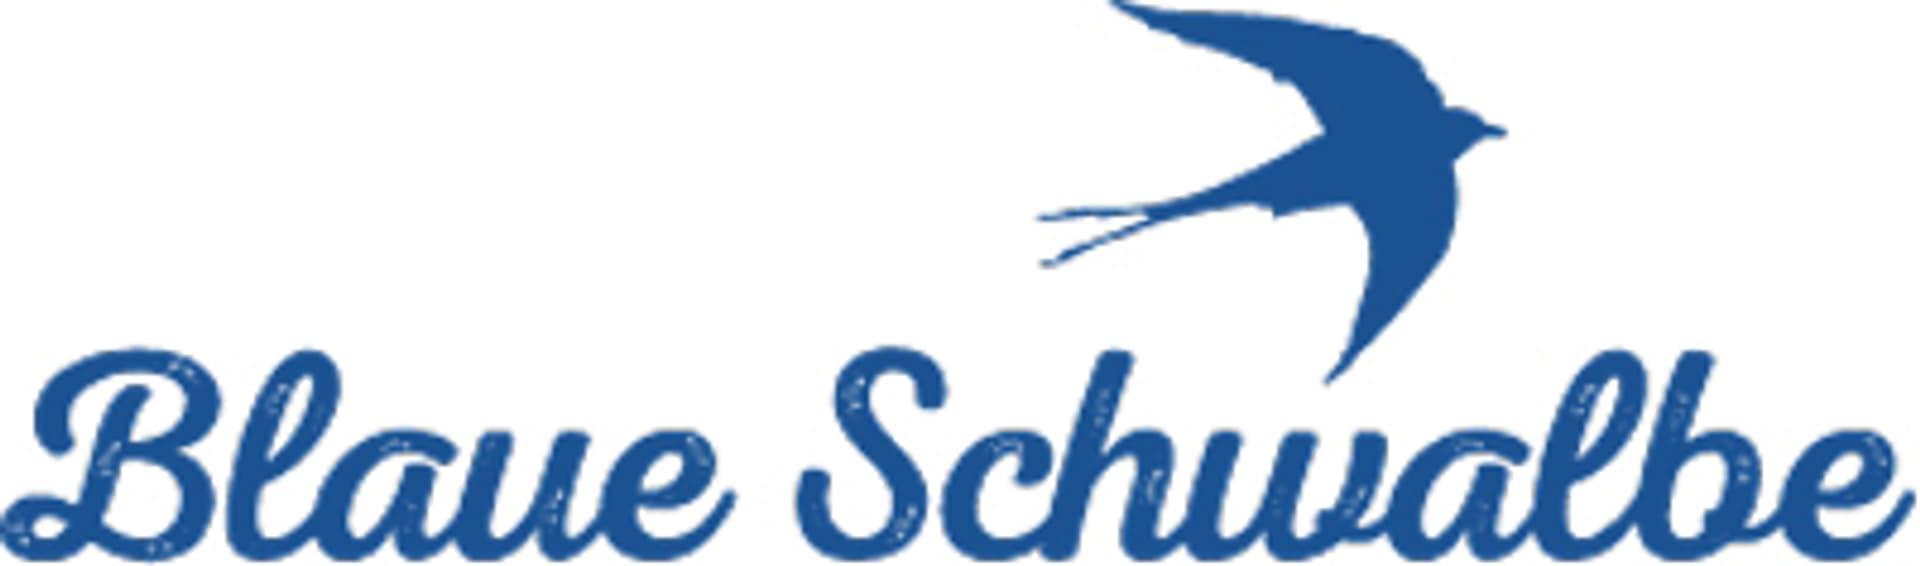 Blaue Schwalbe Logo